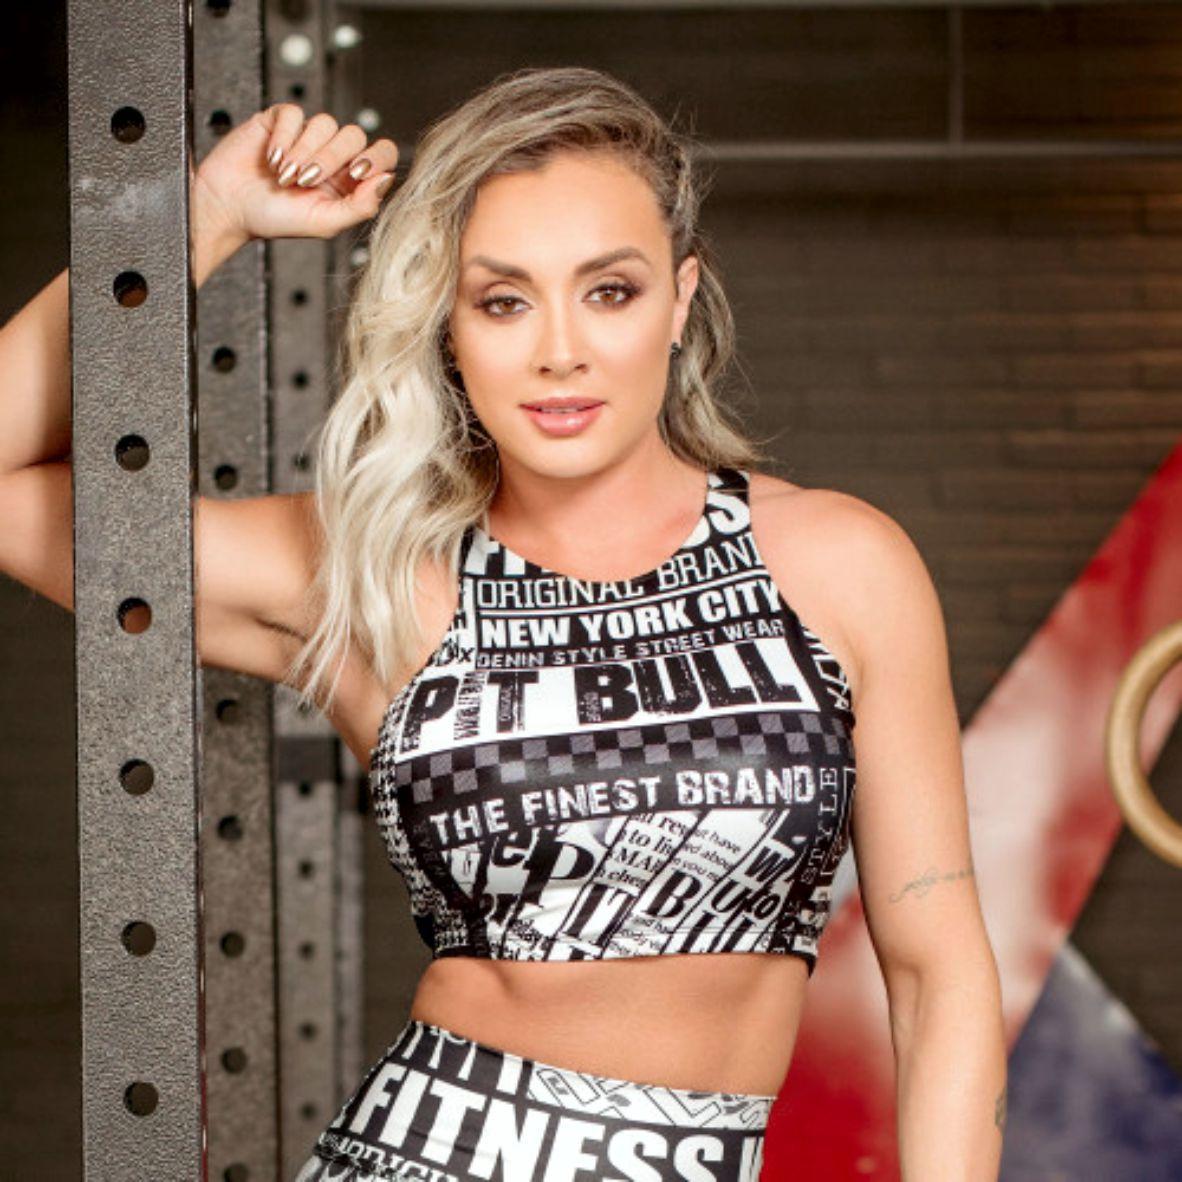 Top Pit Bull 34359 Fitness Grafias